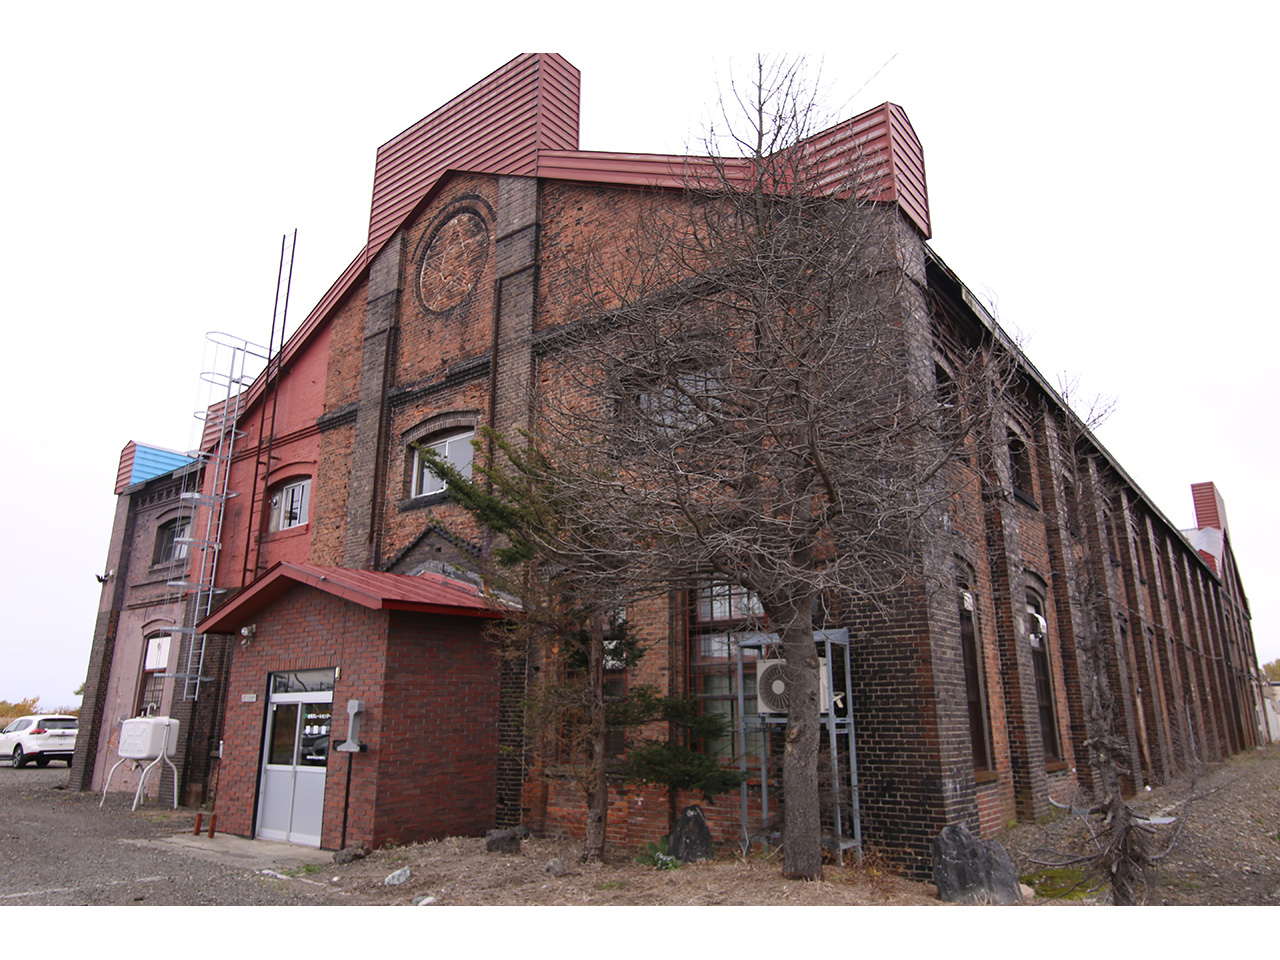 画像:旧北海道炭礦鉄道岩見沢工場(岩見沢レールセンター)(1)